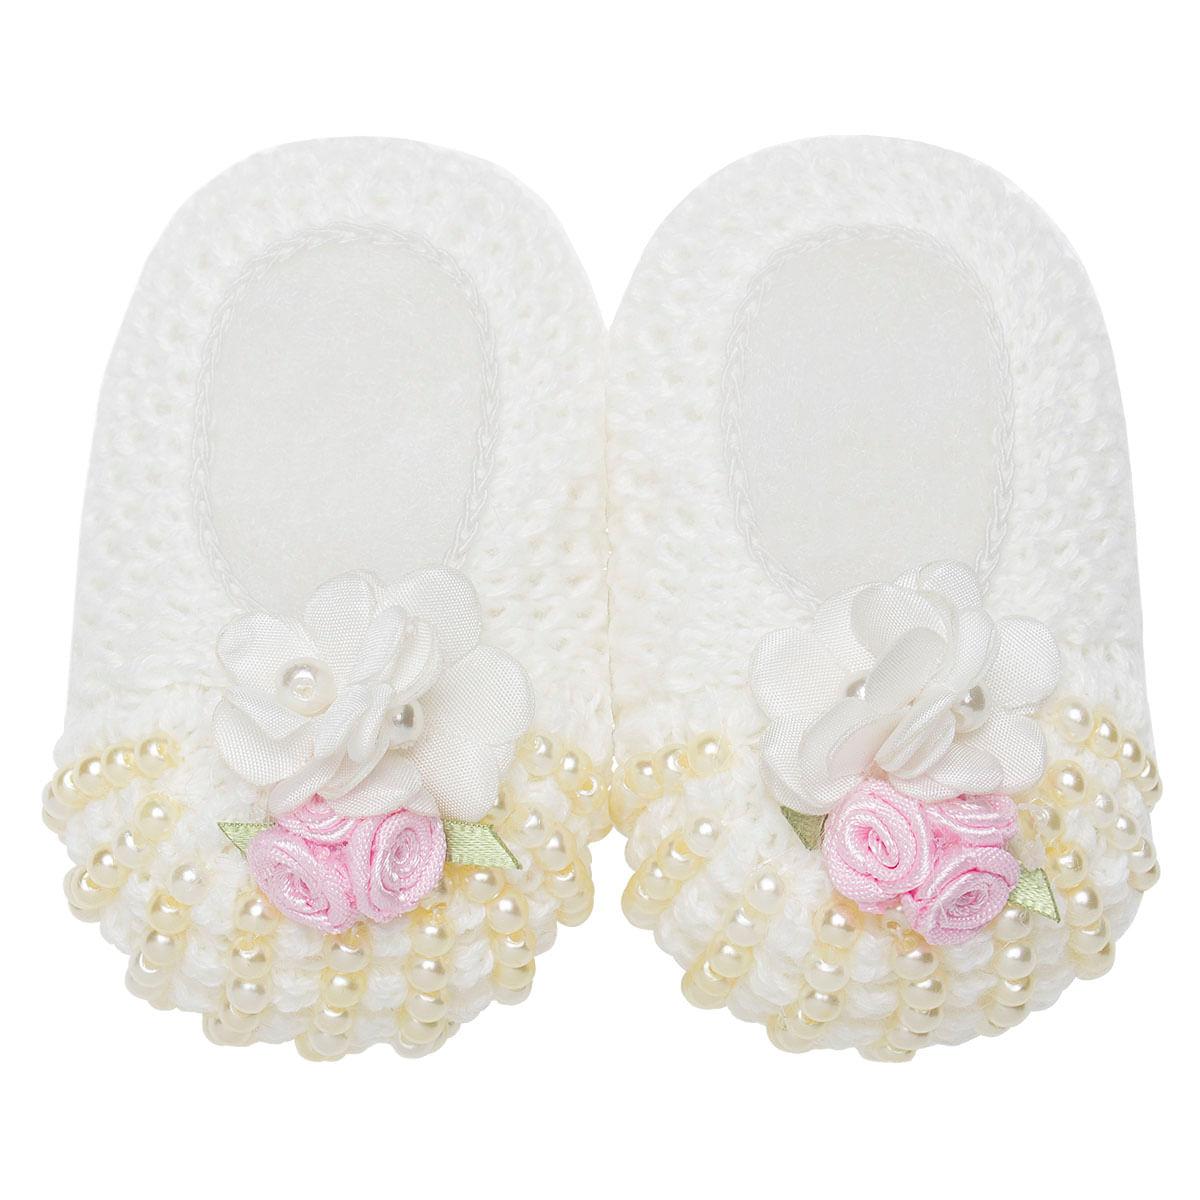 8b2903209 Sapatinho para bebe em tricot Mini Pérolas Marfim/Rosa - Roana - bebefacil